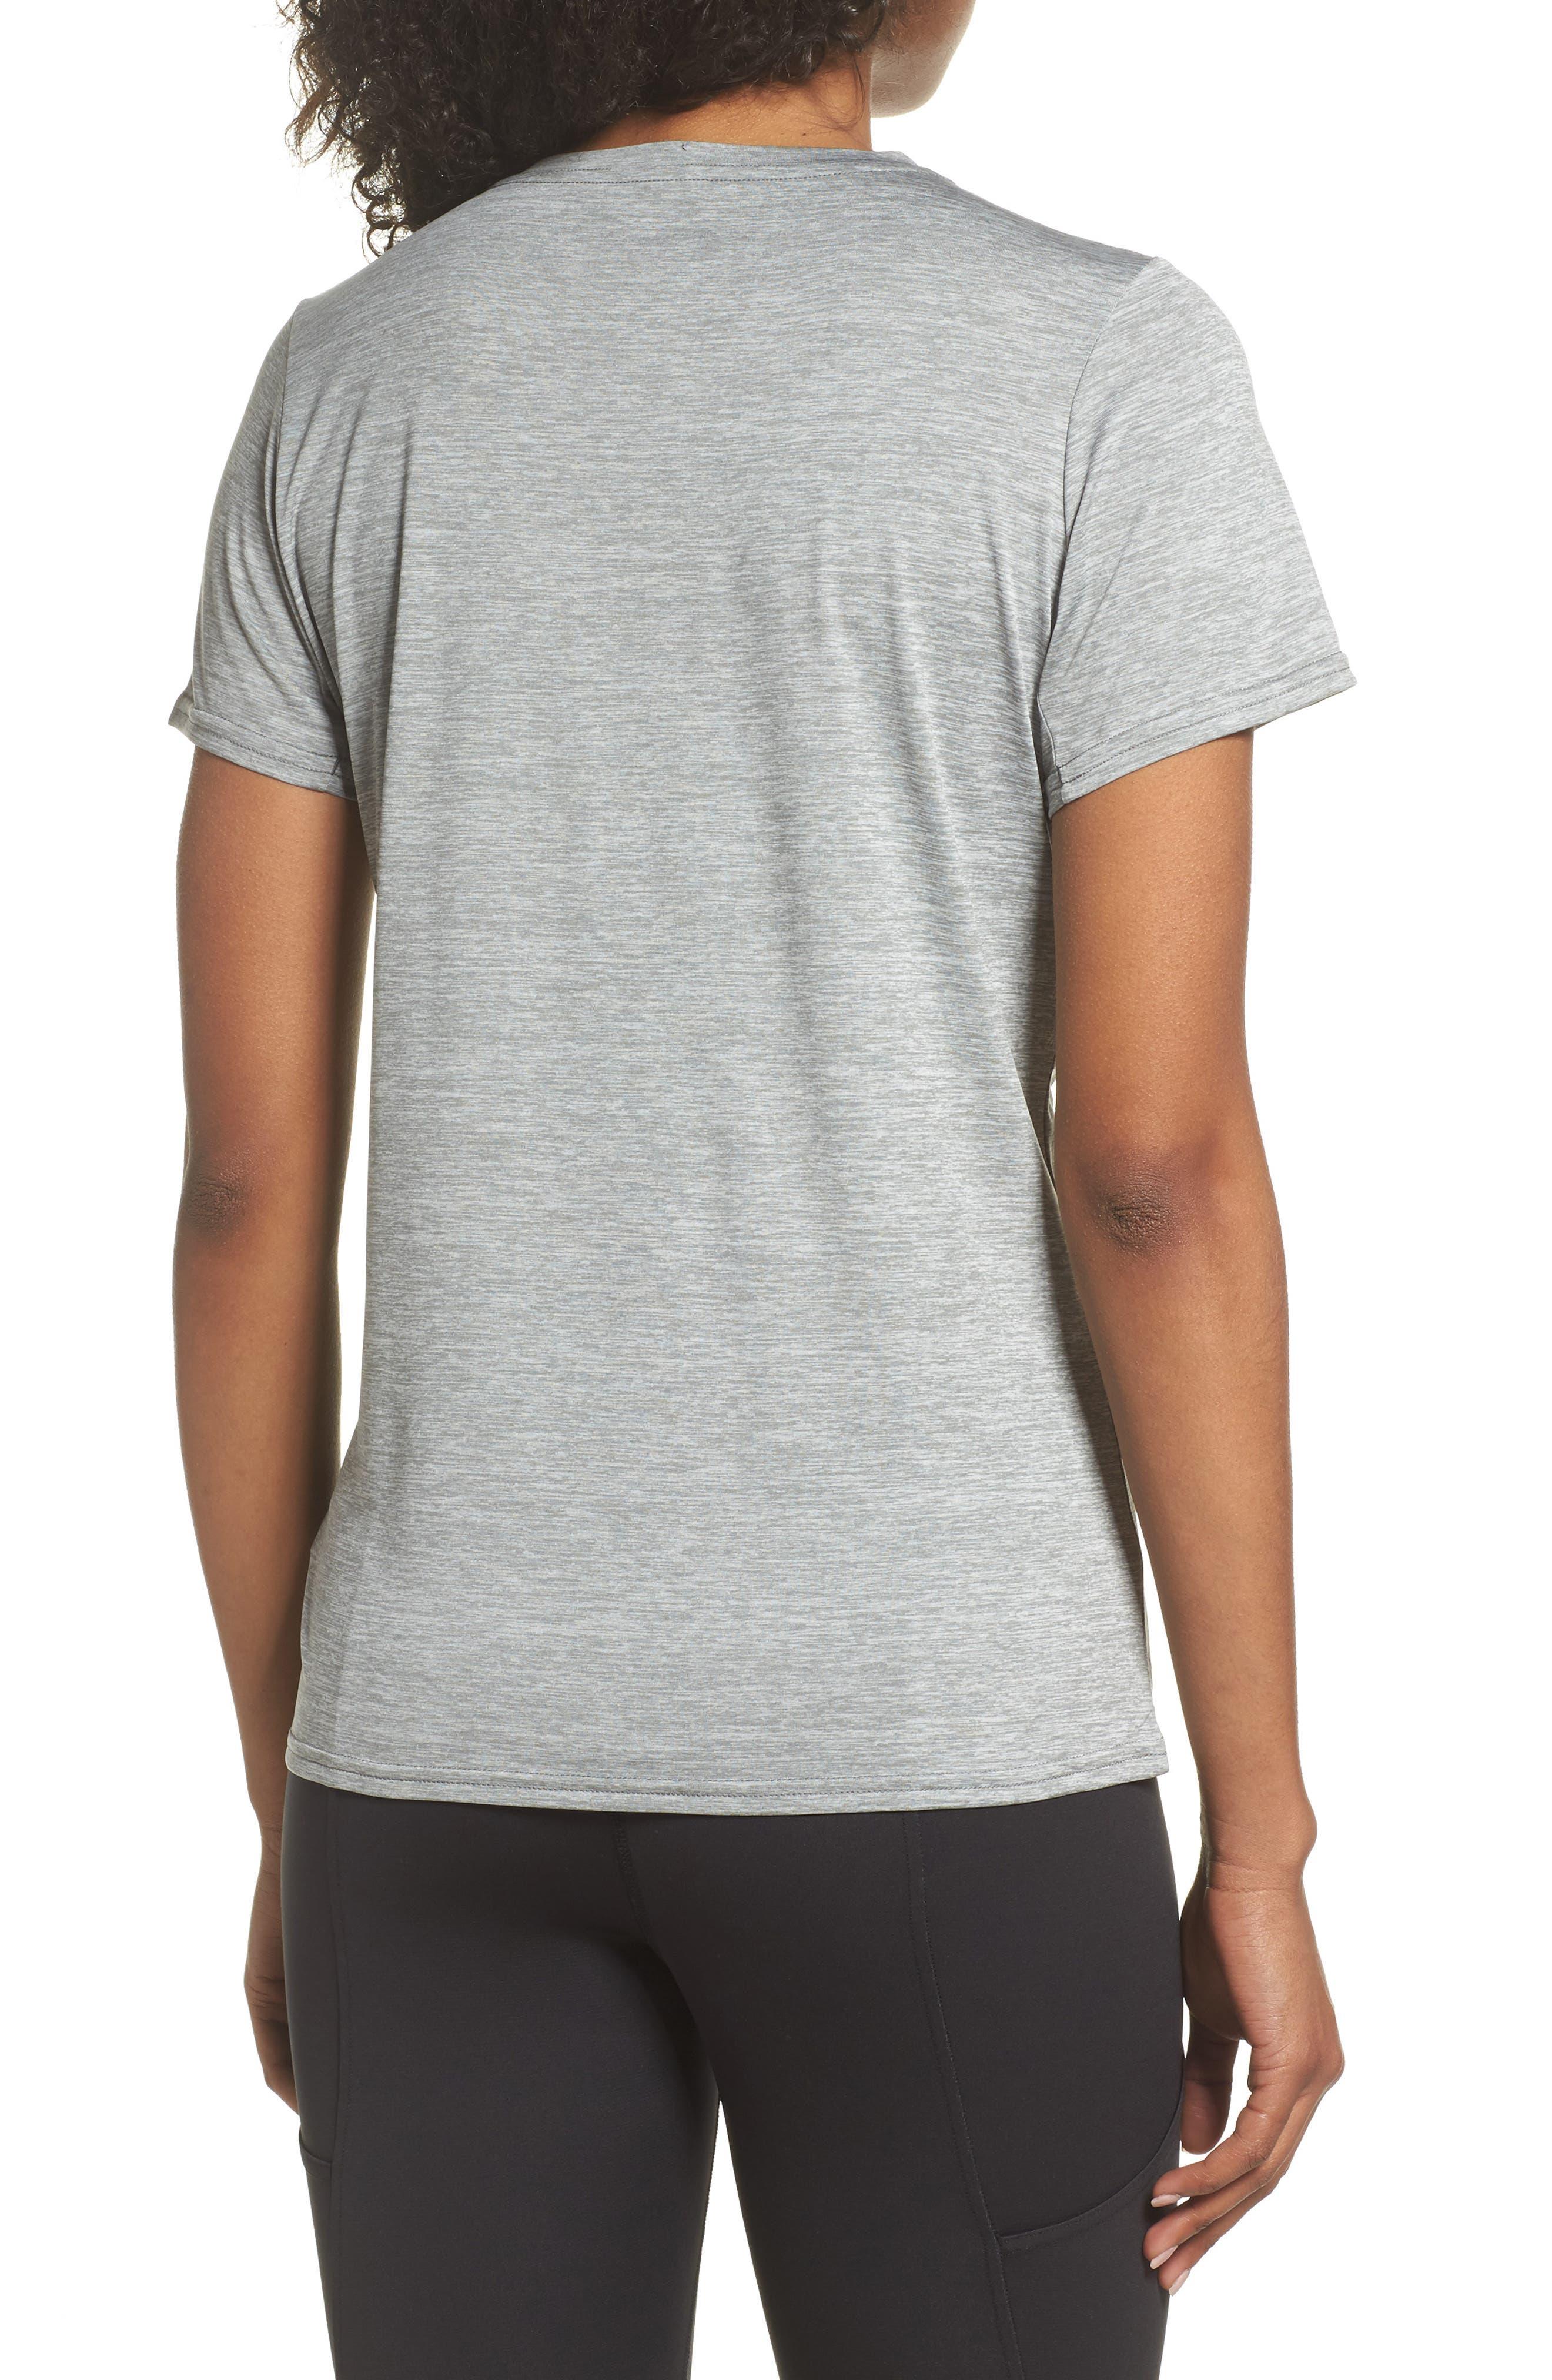 Capilene<sup>®</sup> Dailty T-Shirt,                             Alternate thumbnail 2, color,                             Feather Grey